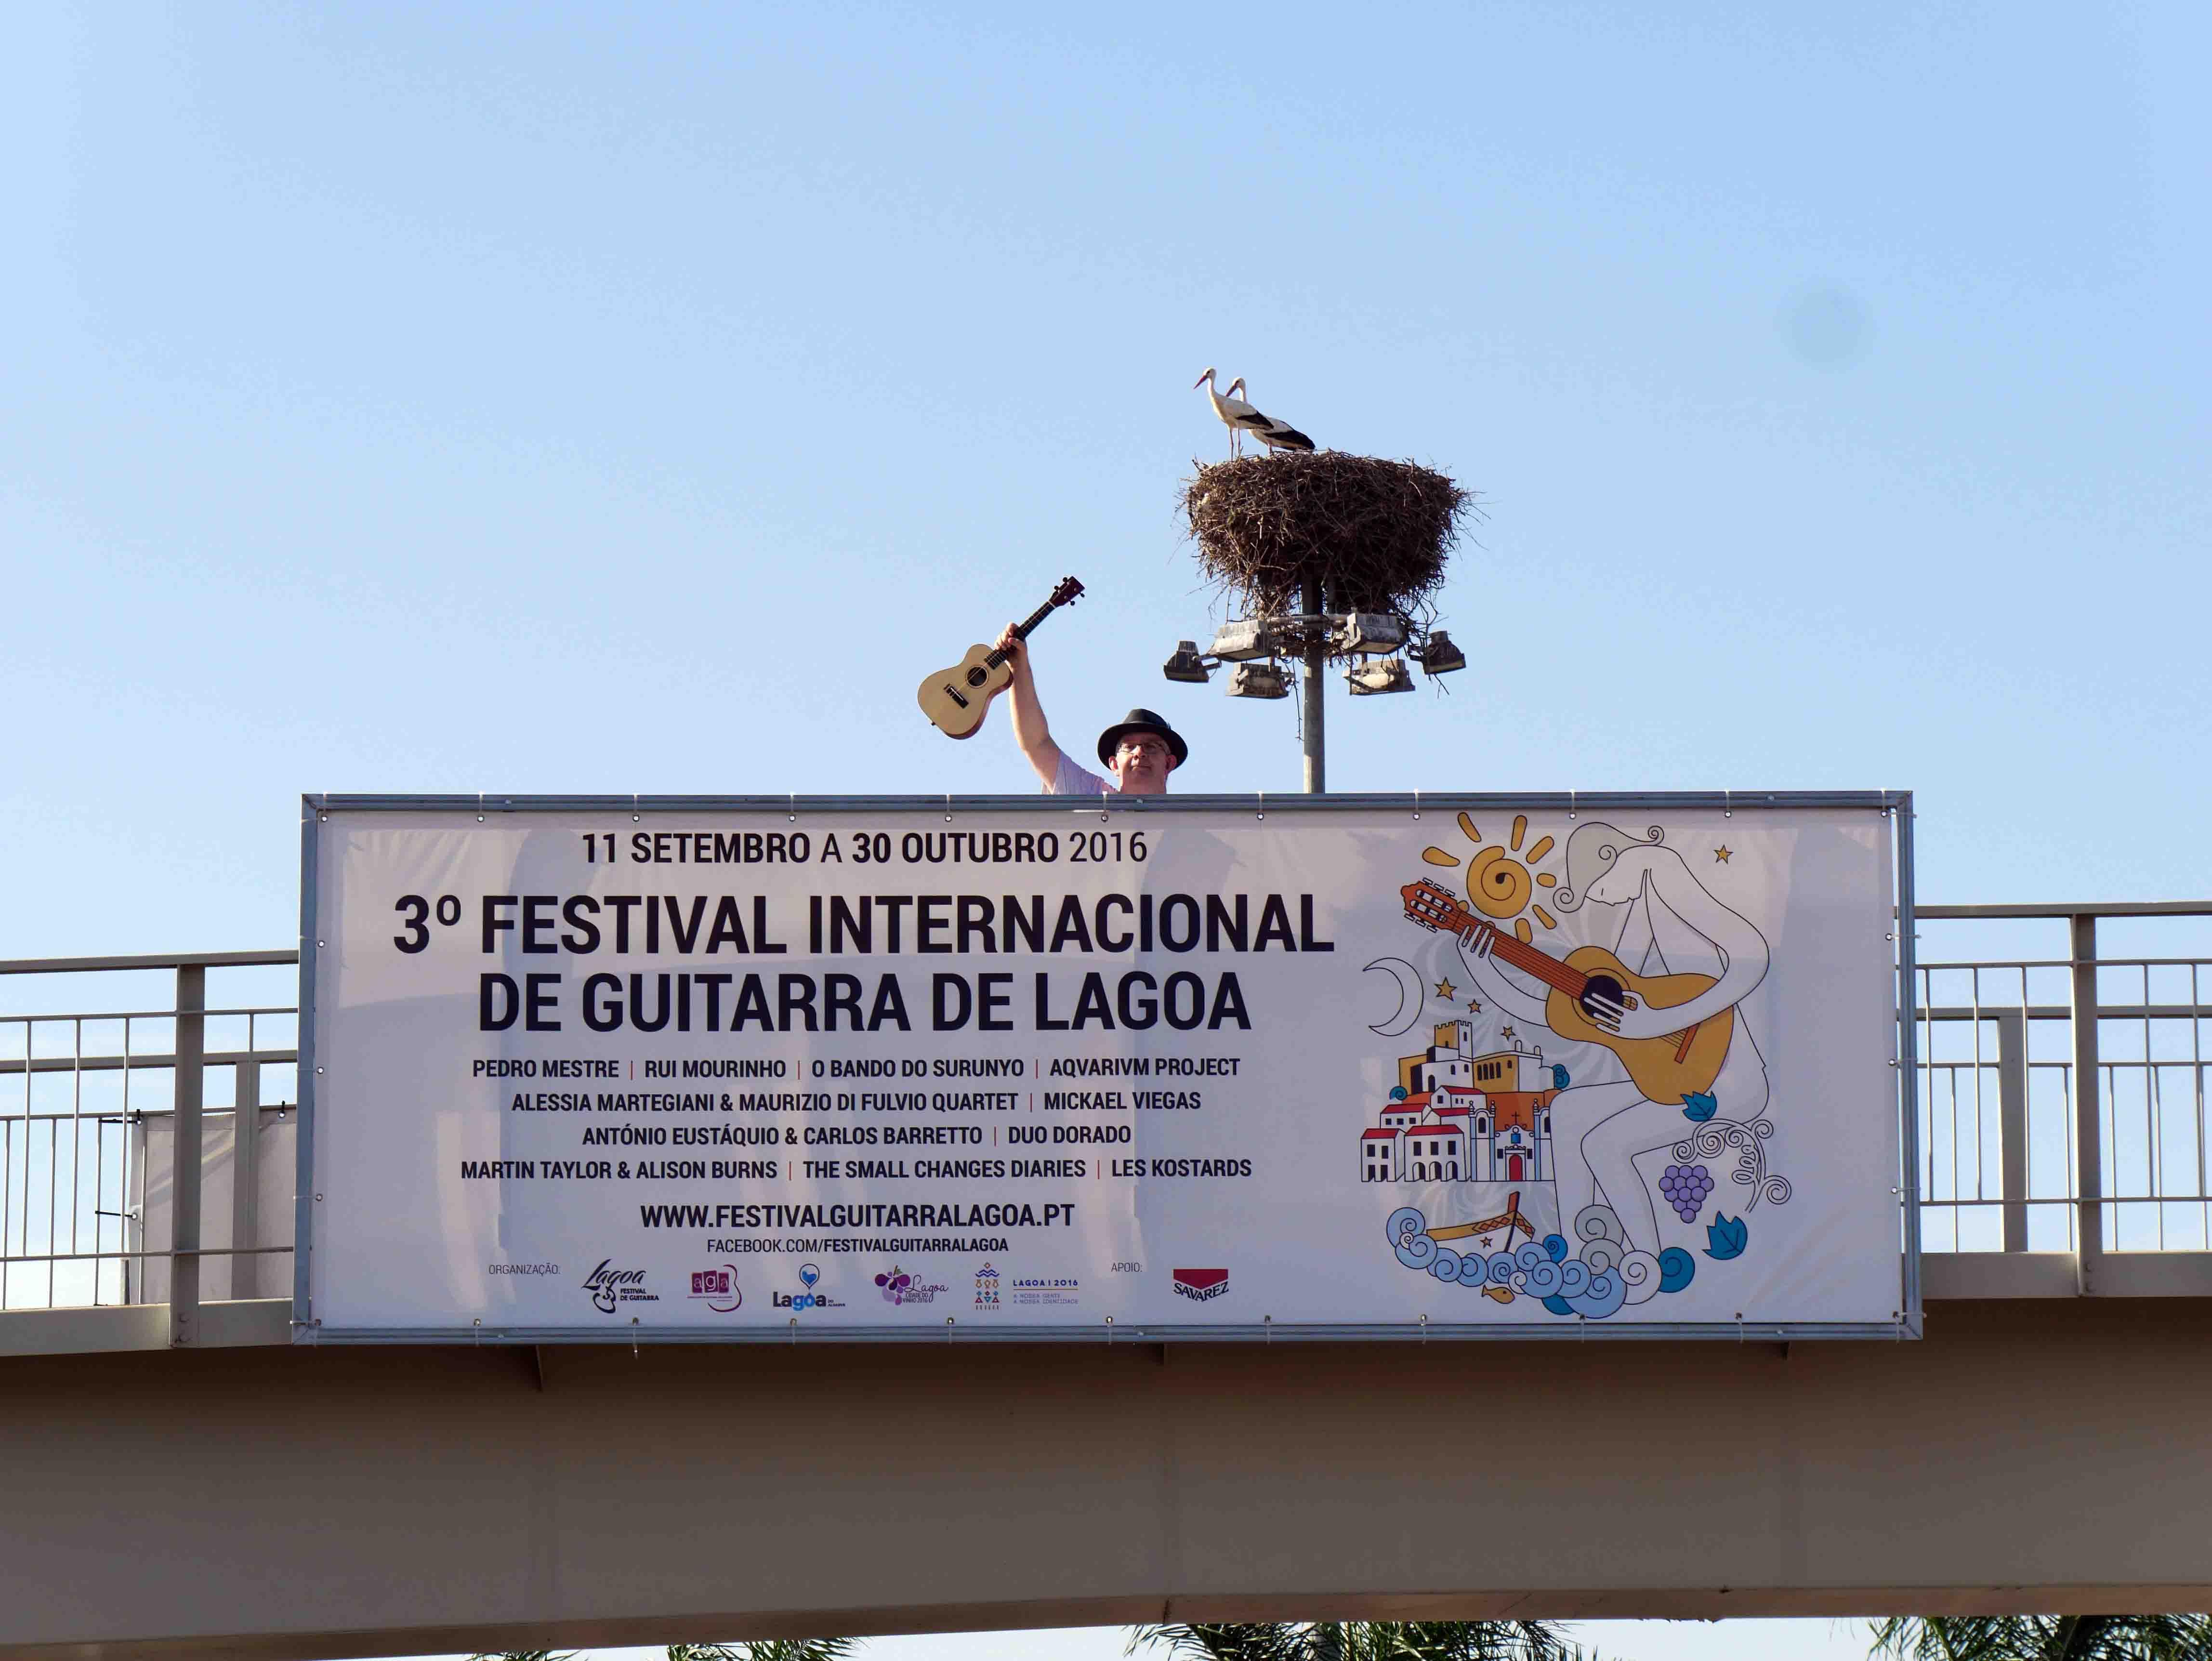 lagoa guitar festival